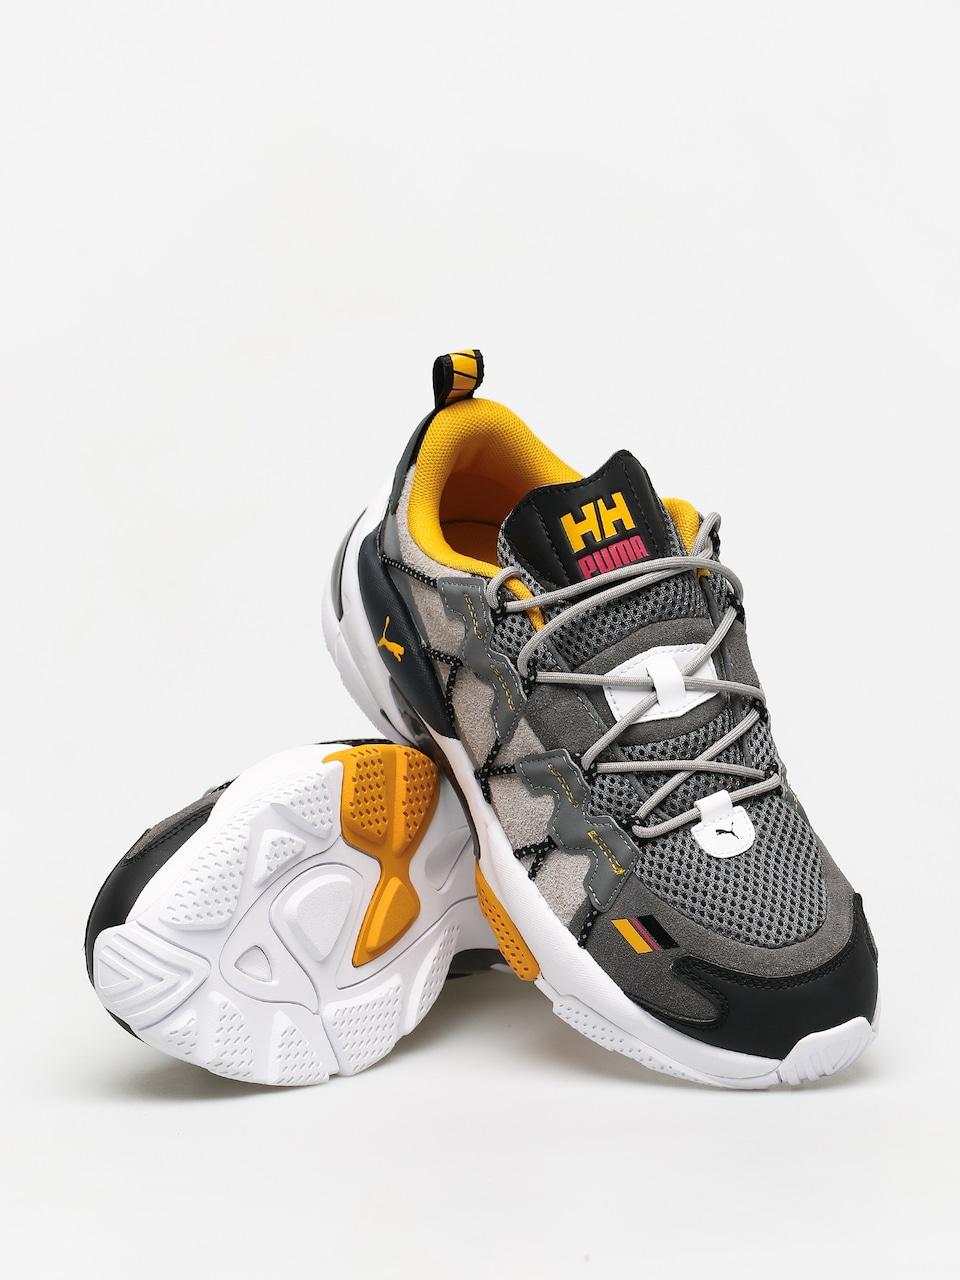 Puma Lqd Cell Helly Hansen Shoes (gray)